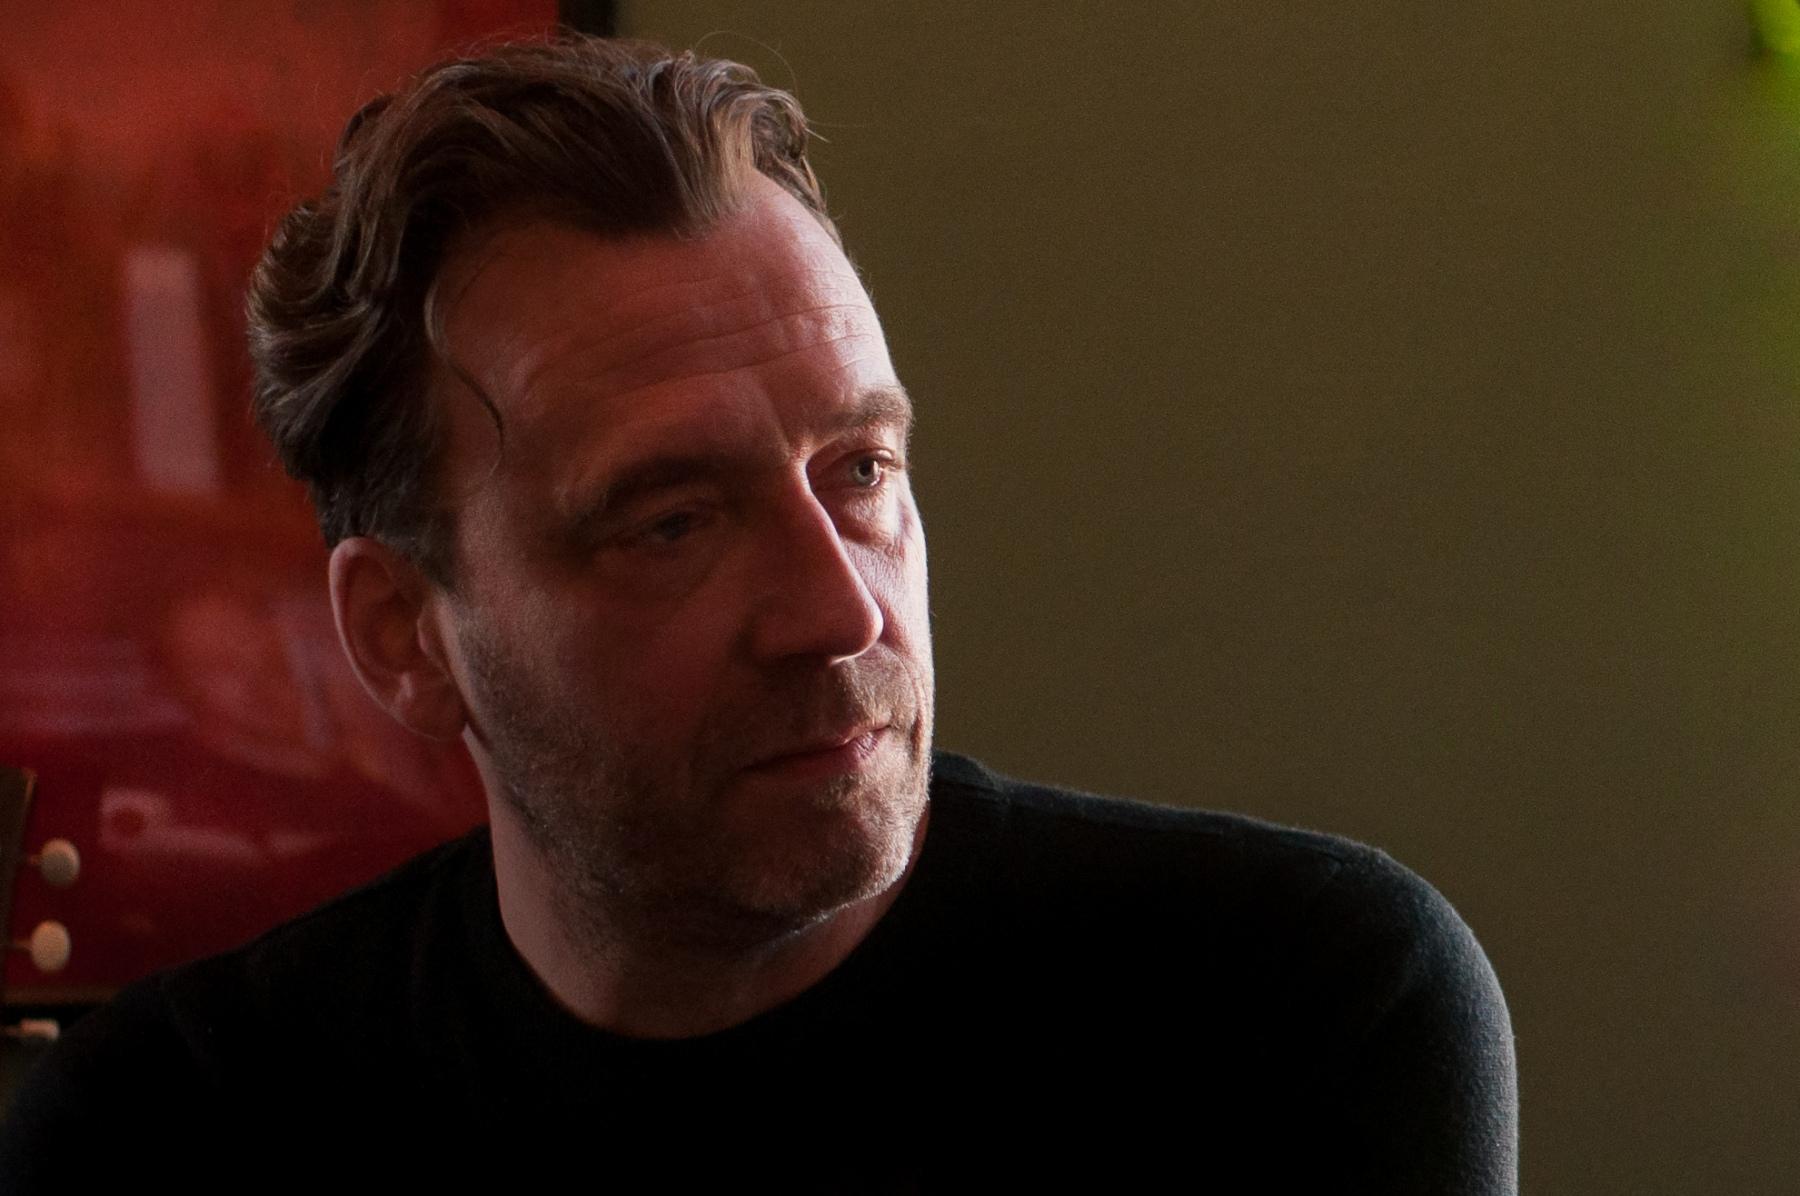 Nikolaj-Nørlund-BEAT-2019